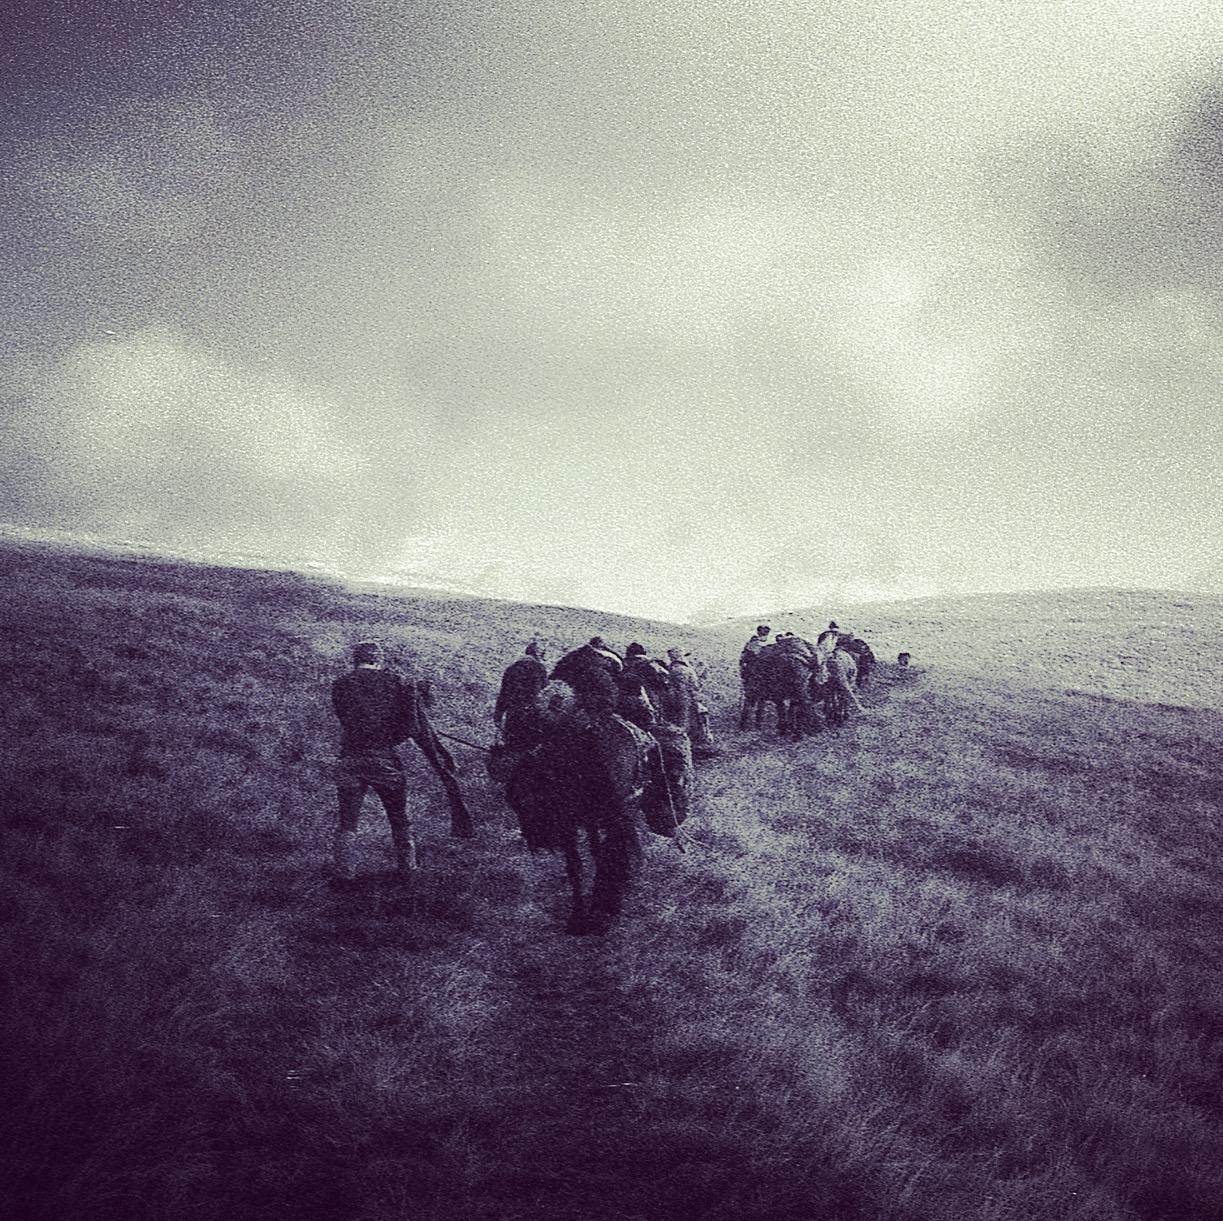 Leading a trek across the Howgill fells